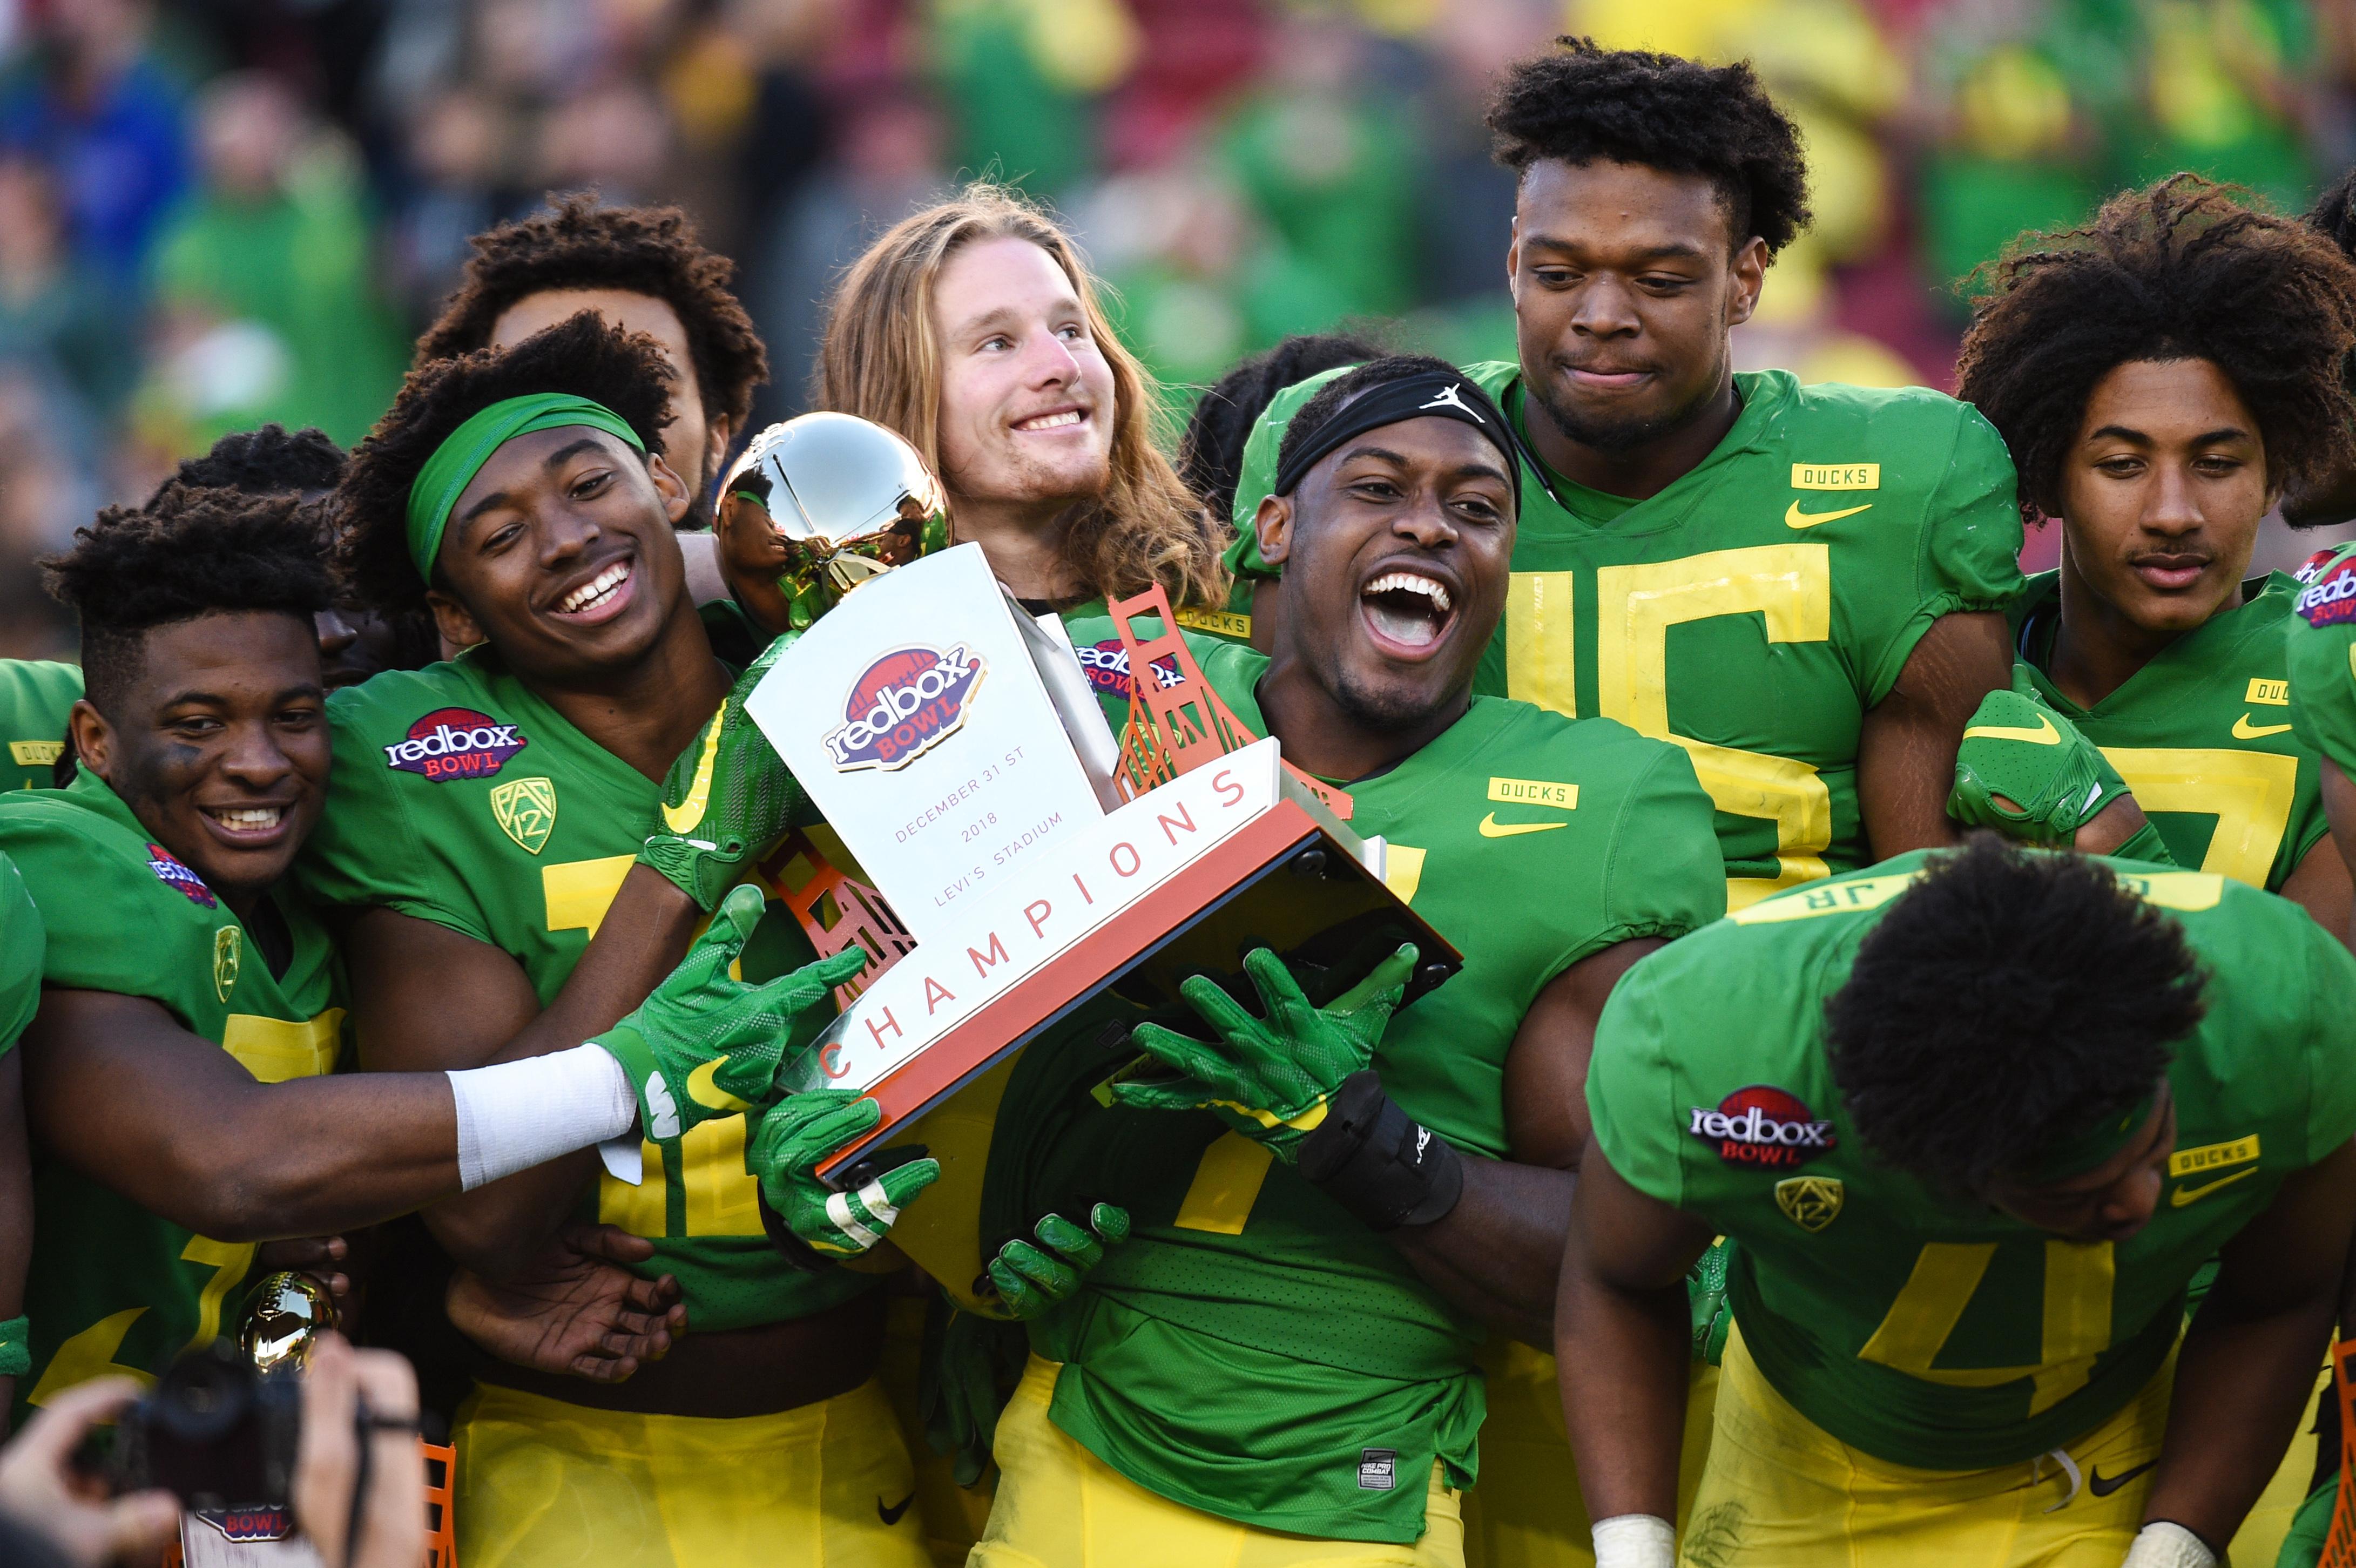 COLLEGE FOOTBALL: DEC 31 Redbox Bowl - Michigan State v Oregon